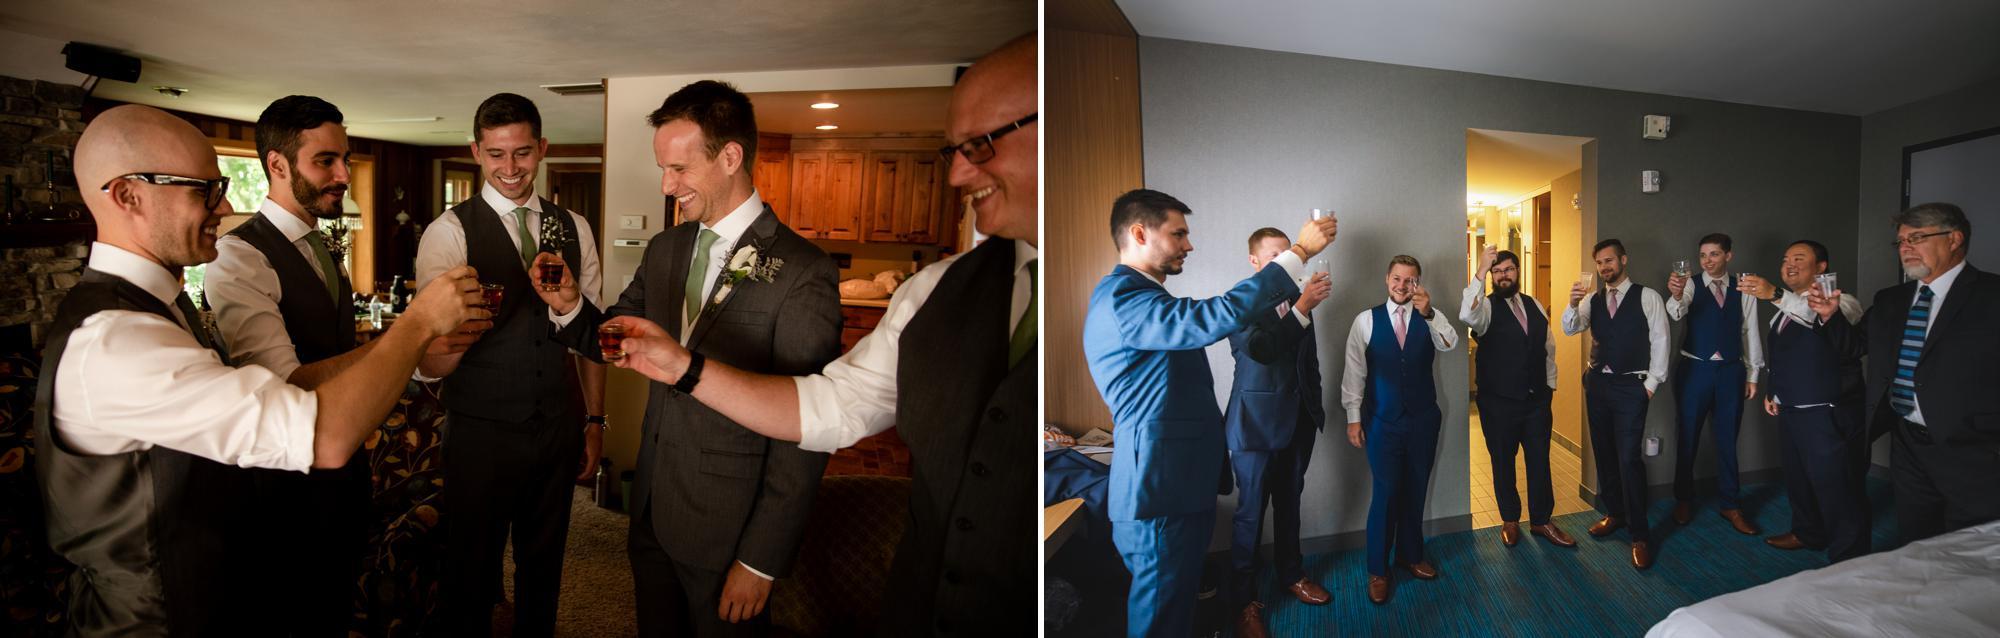 Wisconsin-Wedding-Photography-Blog-27